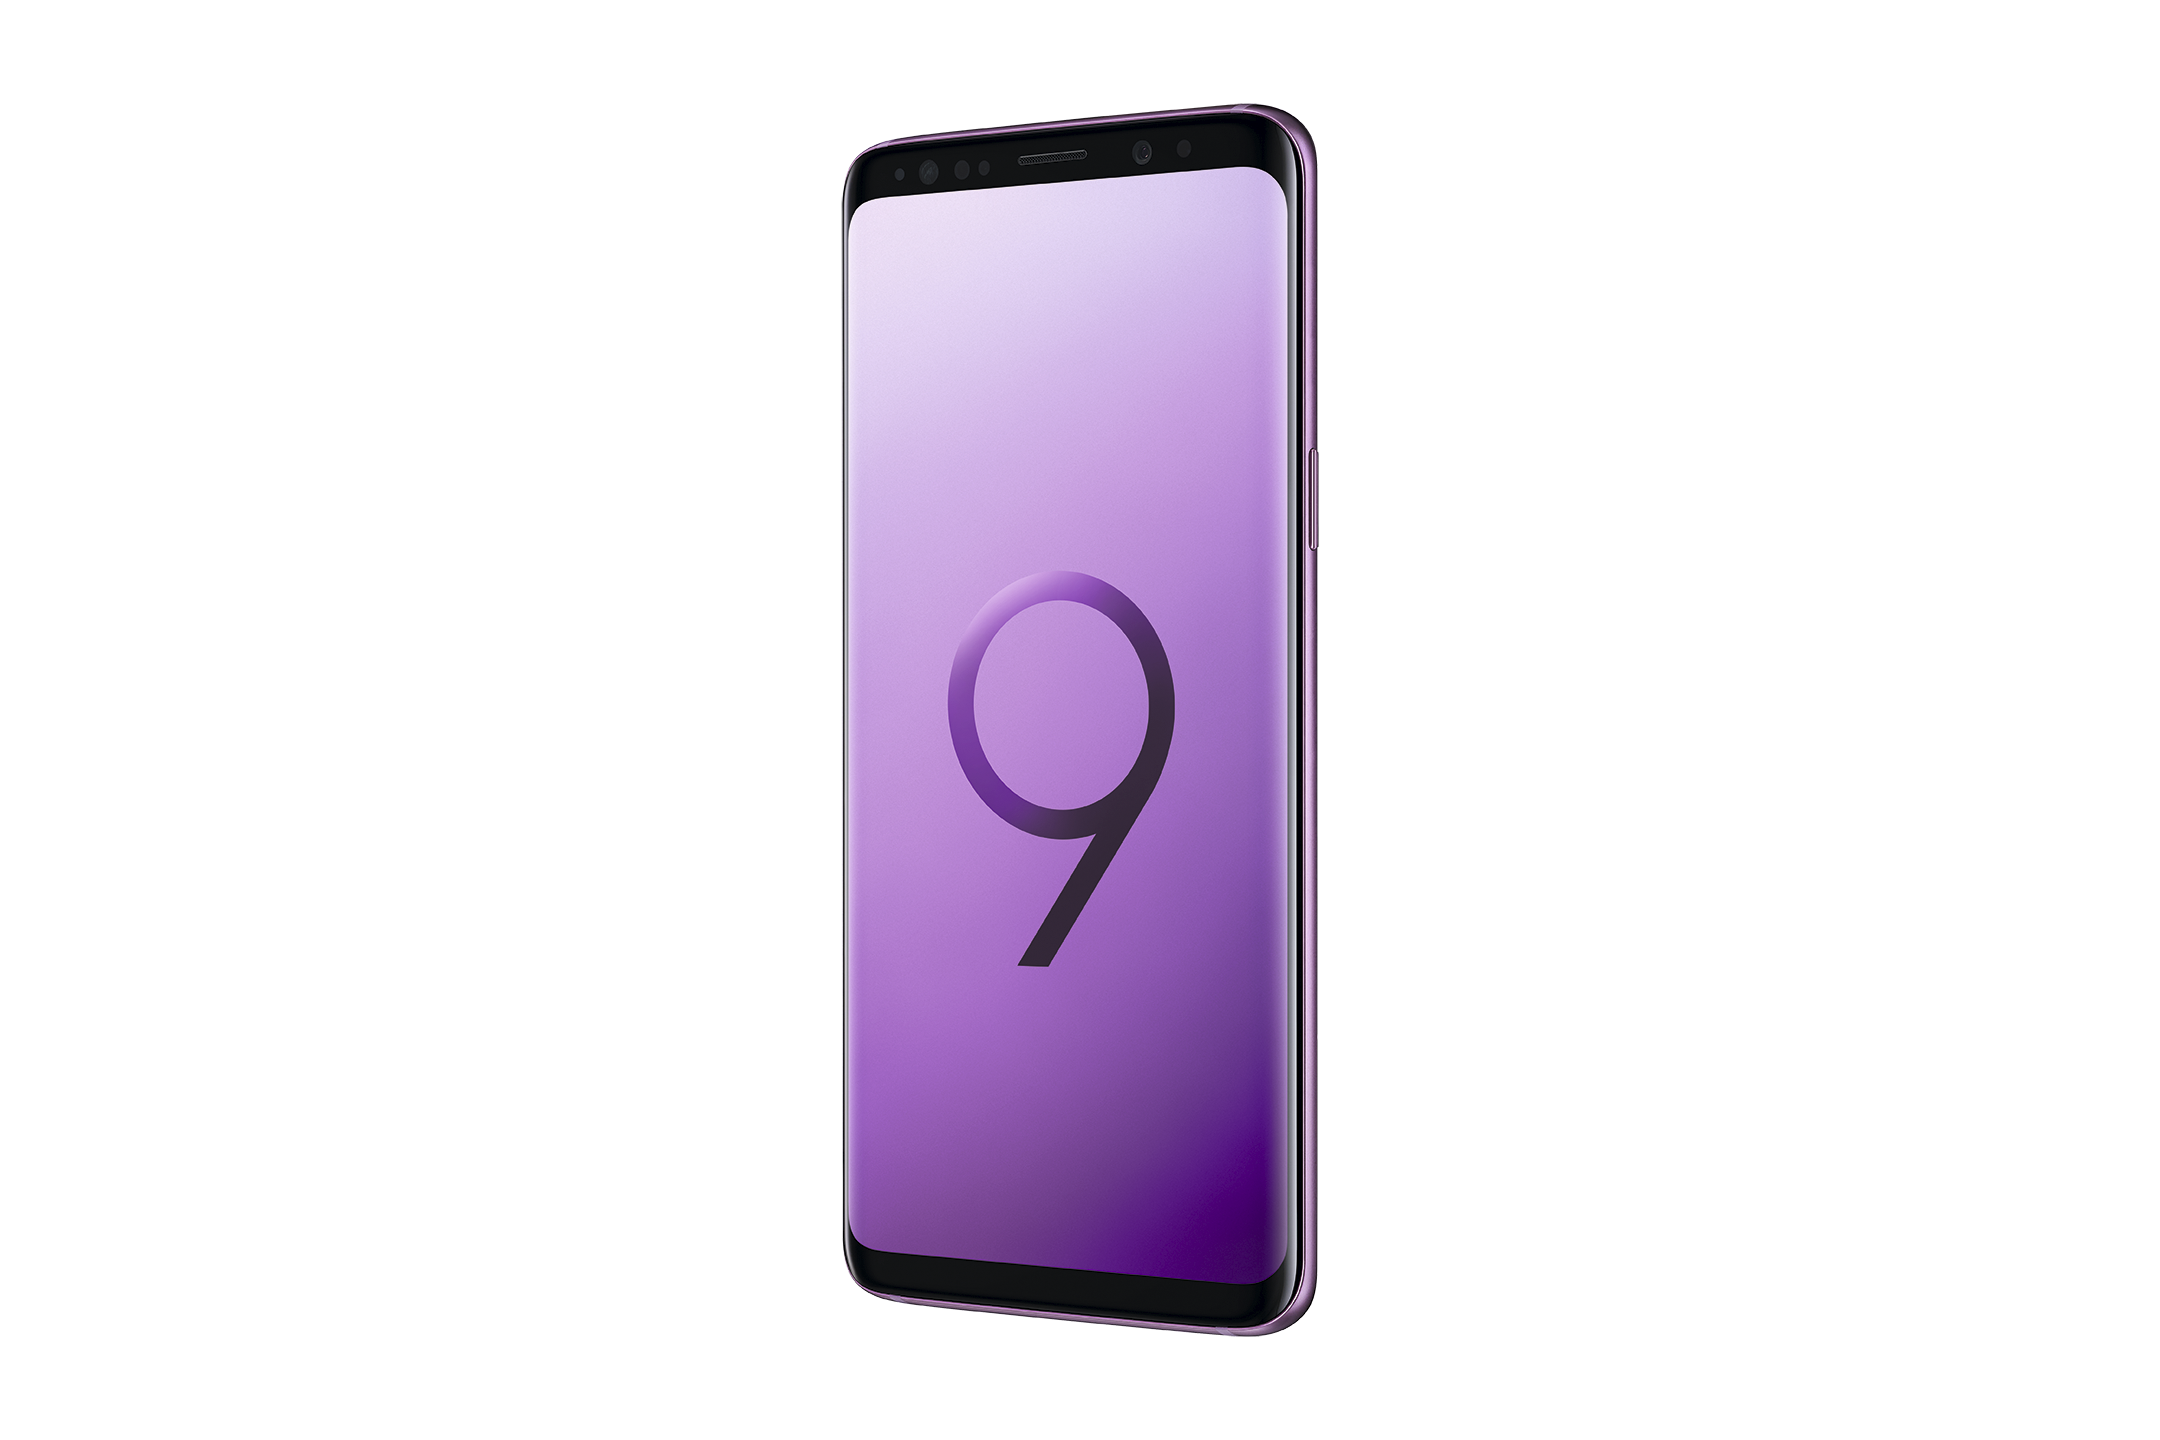 8_Samsung Galaxy S9 in Pink